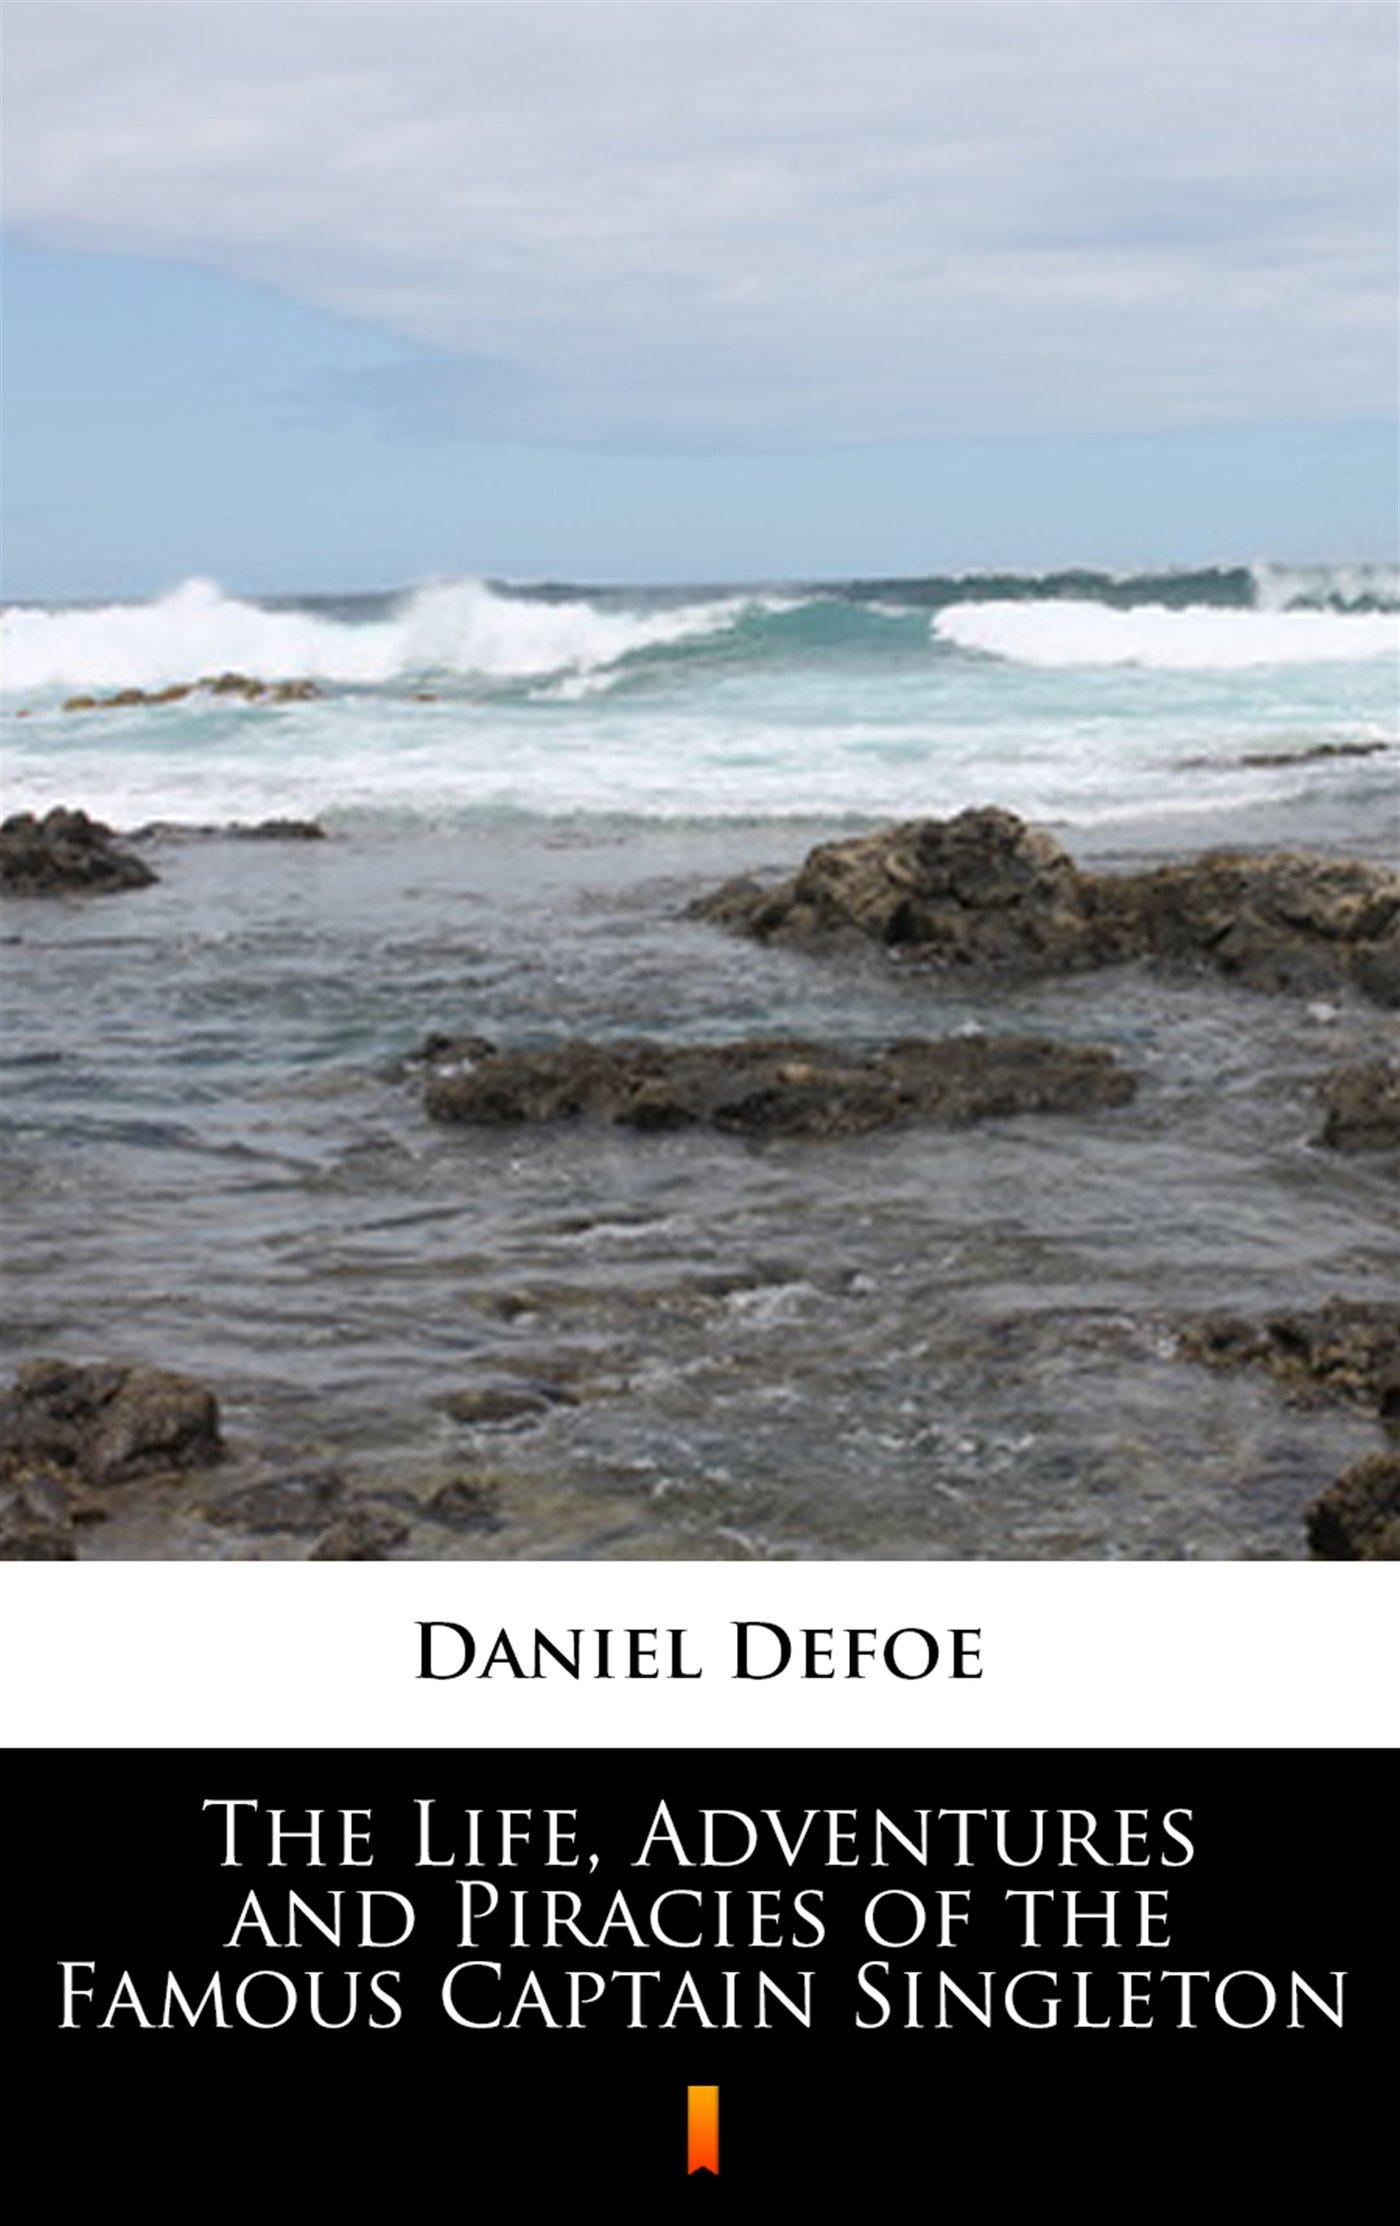 The Life, Adventures and Piracies of the Famous Captain Singleton - Ebook (Książka na Kindle) do pobrania w formacie MOBI